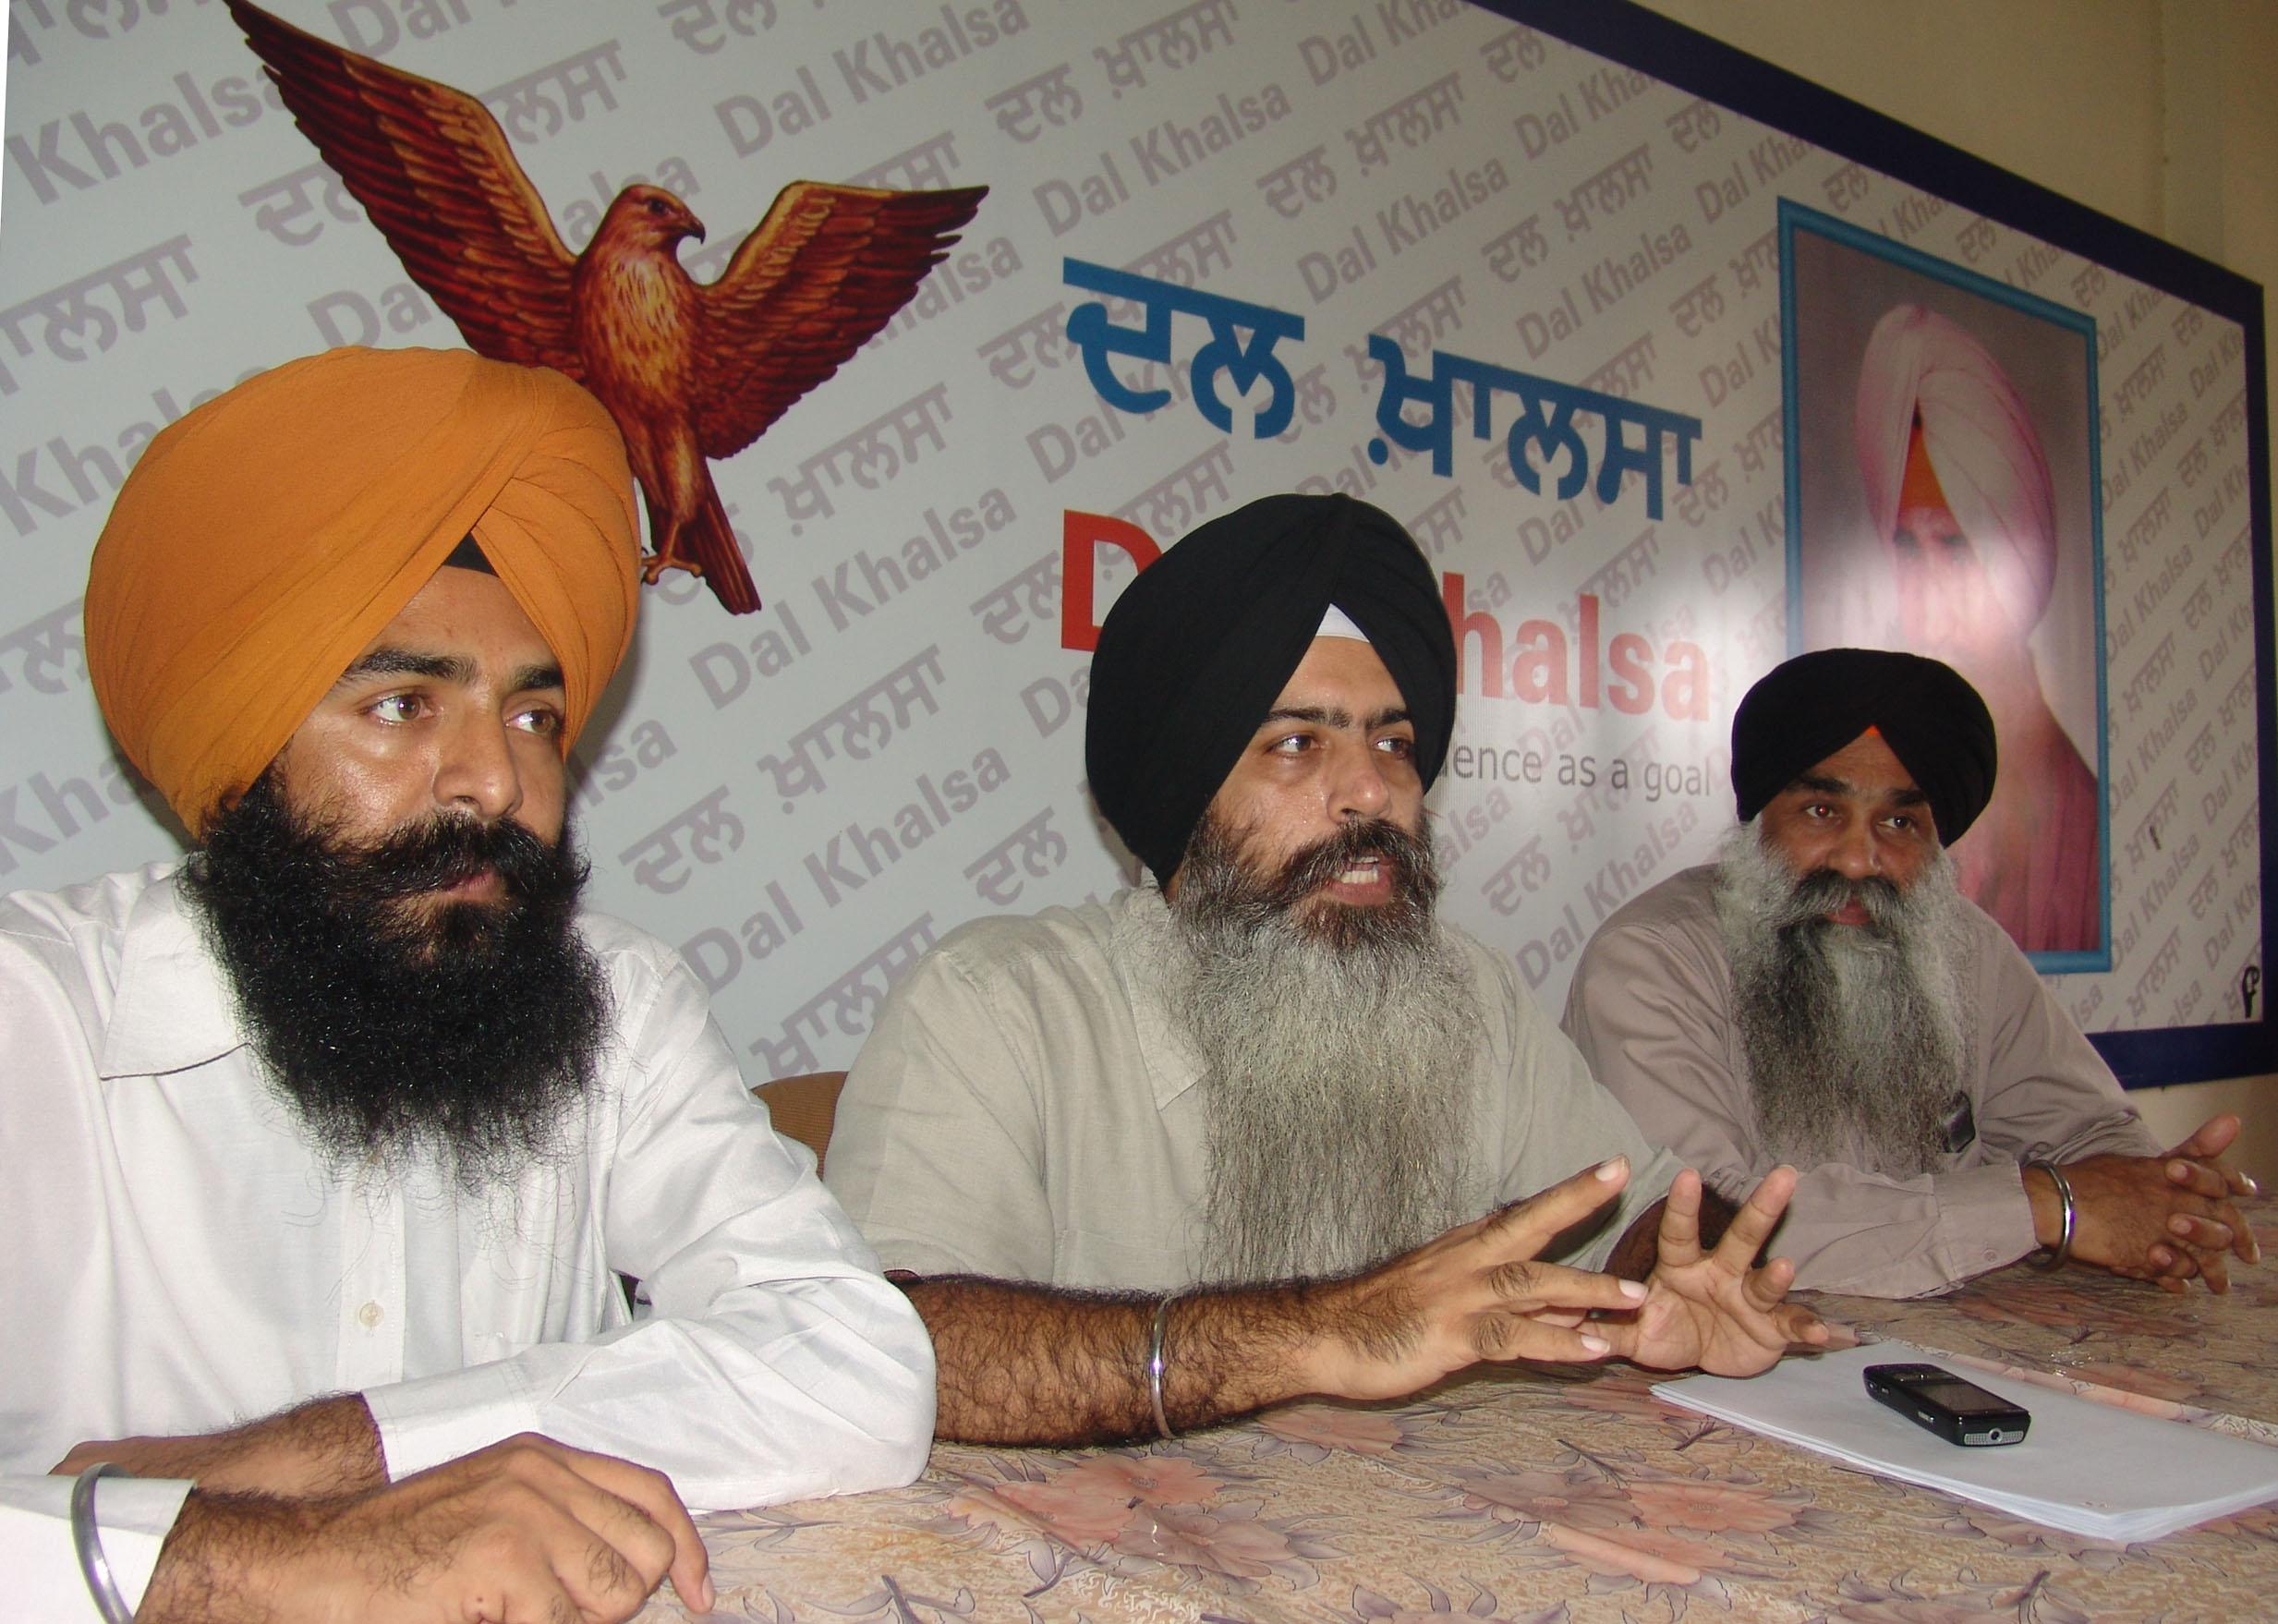 Dal Khalsa urges Capt Amarinder to join prayers at gurdwara to commemorate the attack on Darbar Sahib